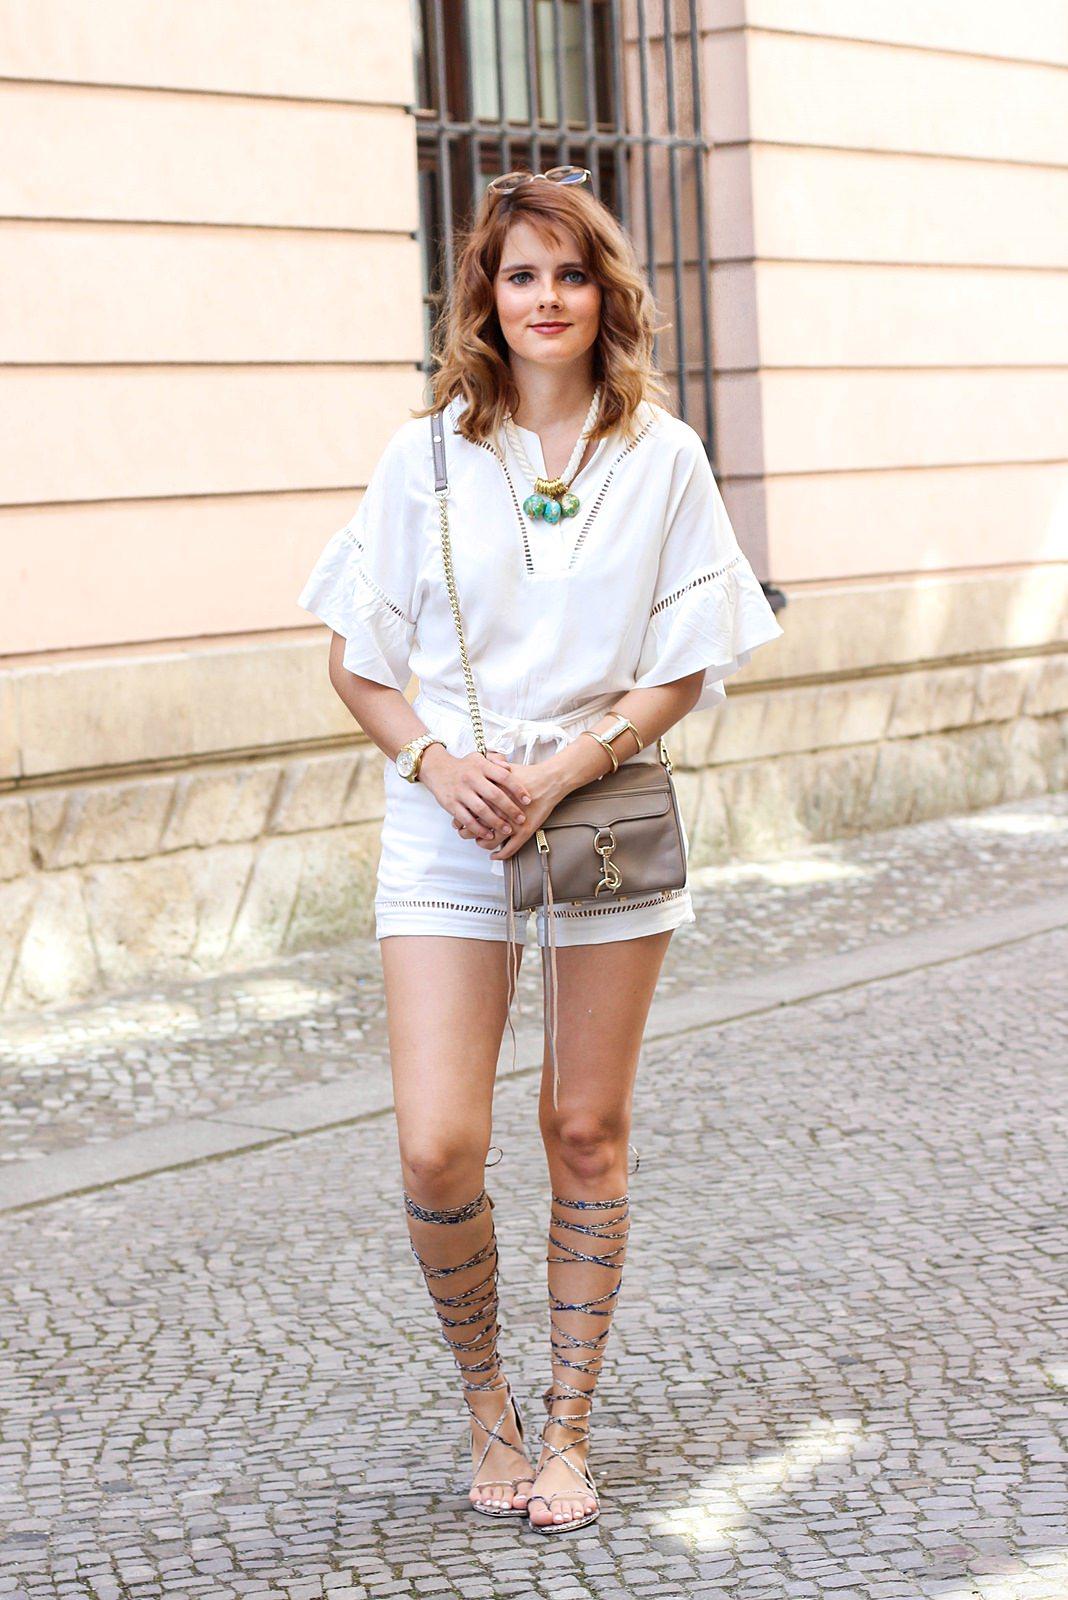 desbelleschoses-sommer-weißer-jumpsuit-gladiatorsandalen-in-berlin 3